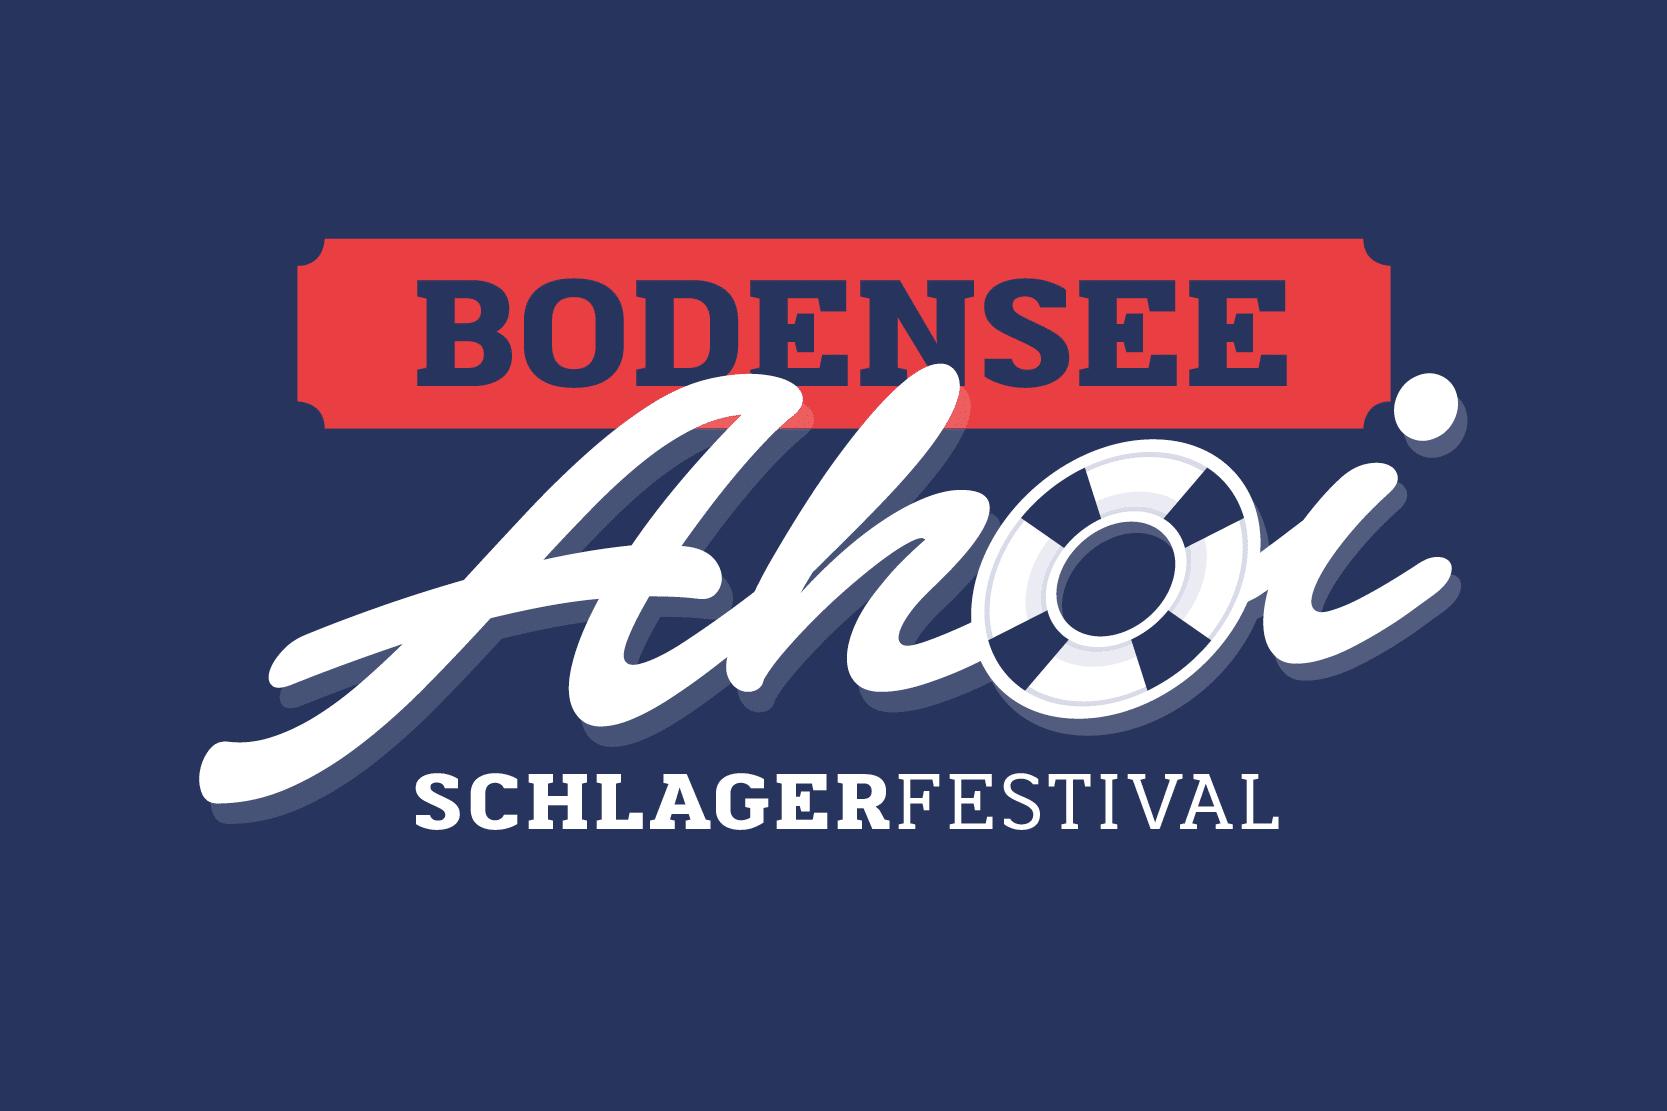 Bodensee Ahoi Schlagerfestival